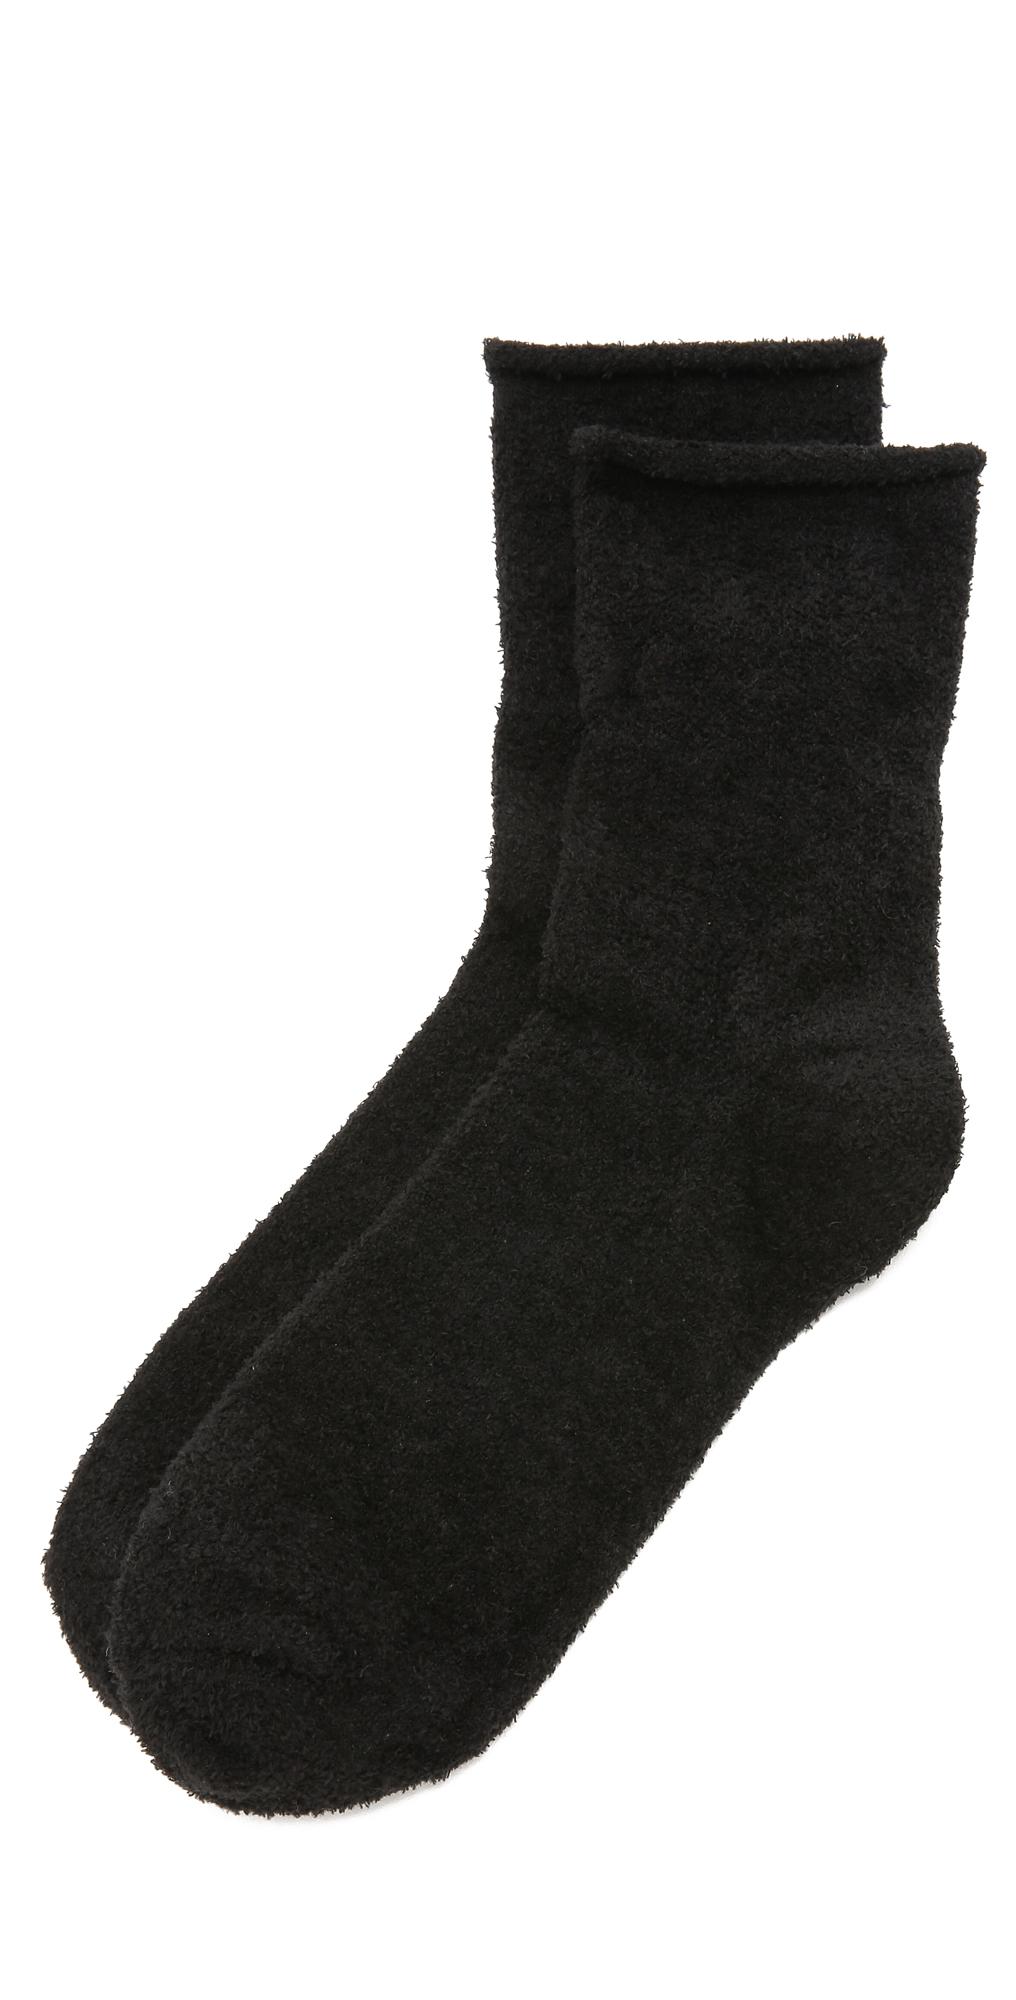 Rolled Fleece Socks Plush